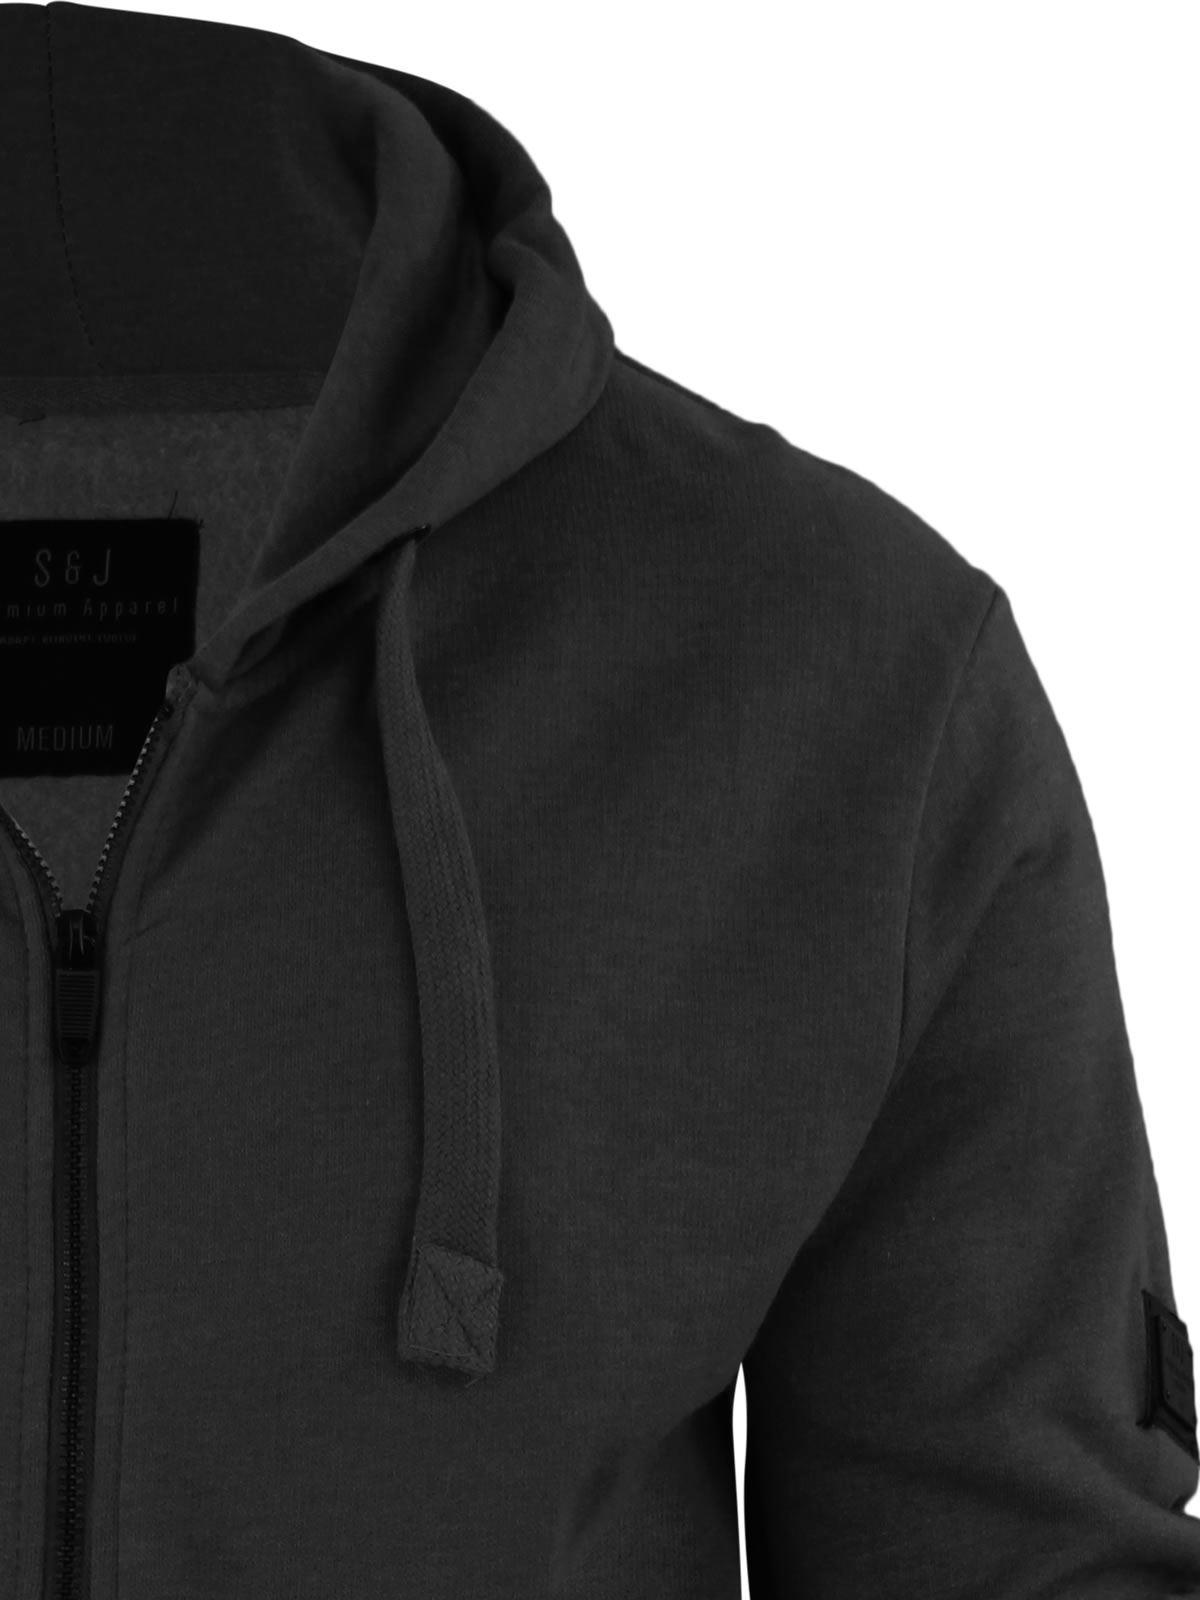 Mens-Hoodie-Smith-amp-Jones-Zip-Up-Hooded-Sweater-Jumper thumbnail 25